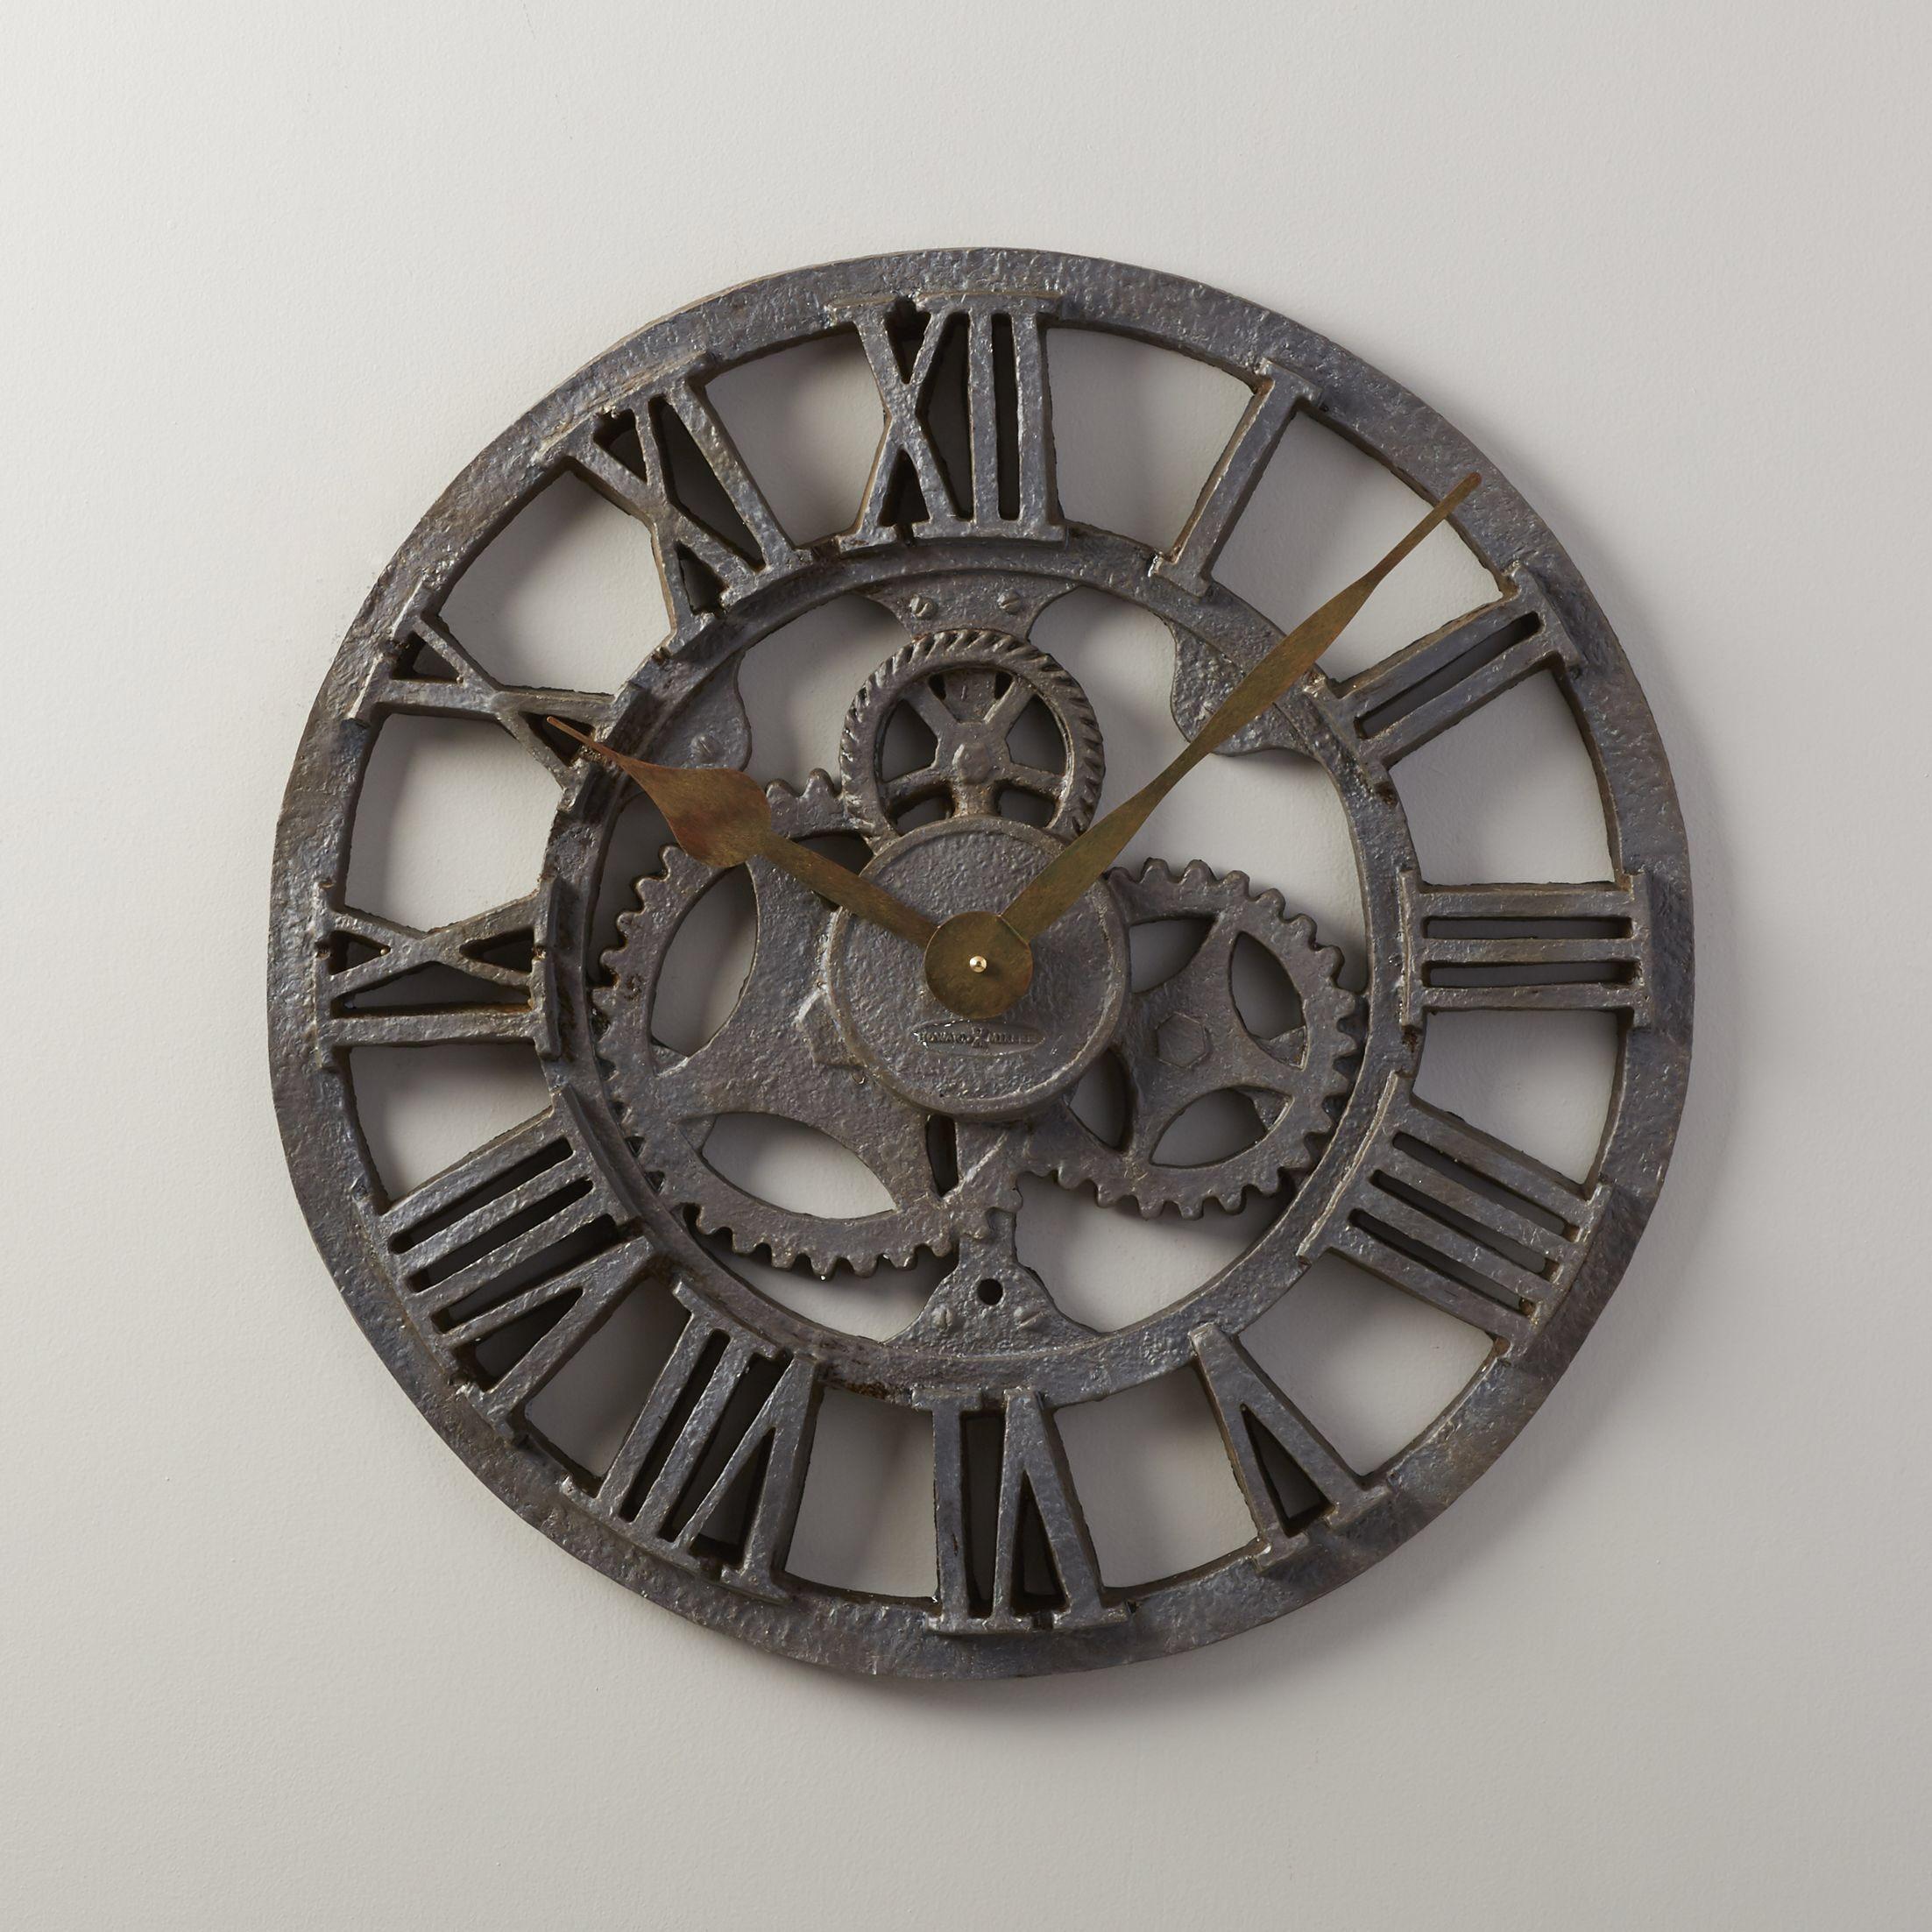 "Henson 21.5"" Wall Clock"